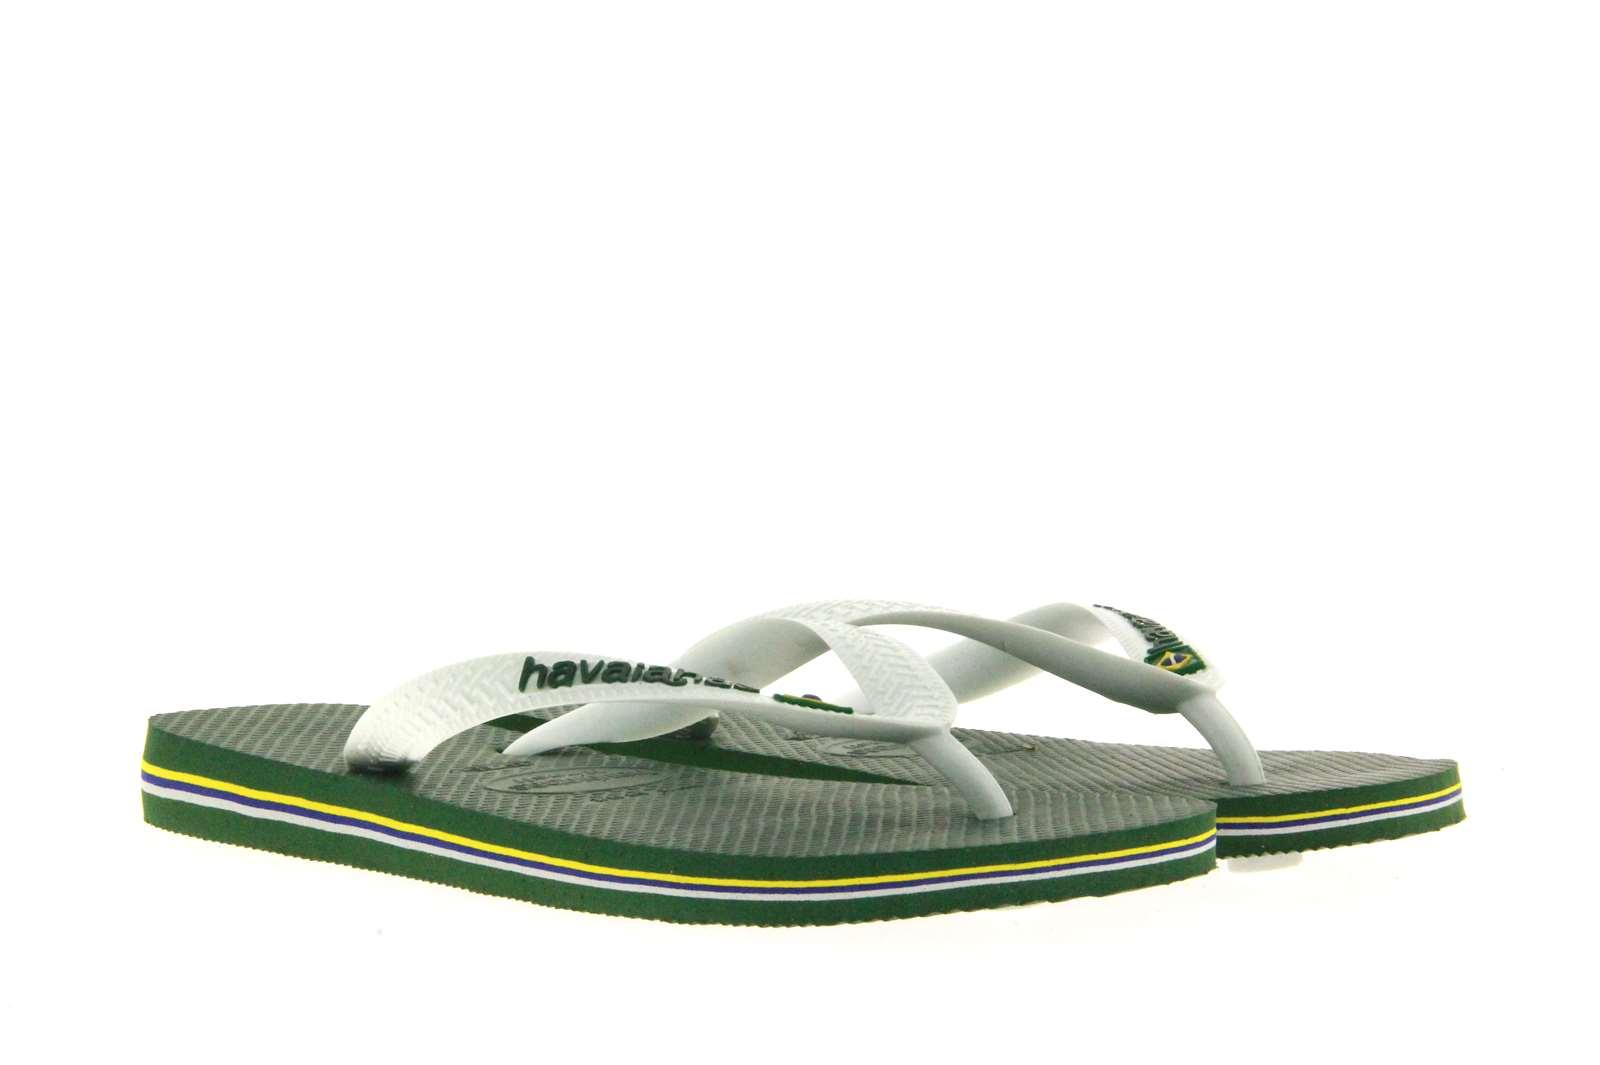 Havaianas toe sandals BRASIL LOGO AMAZONIA